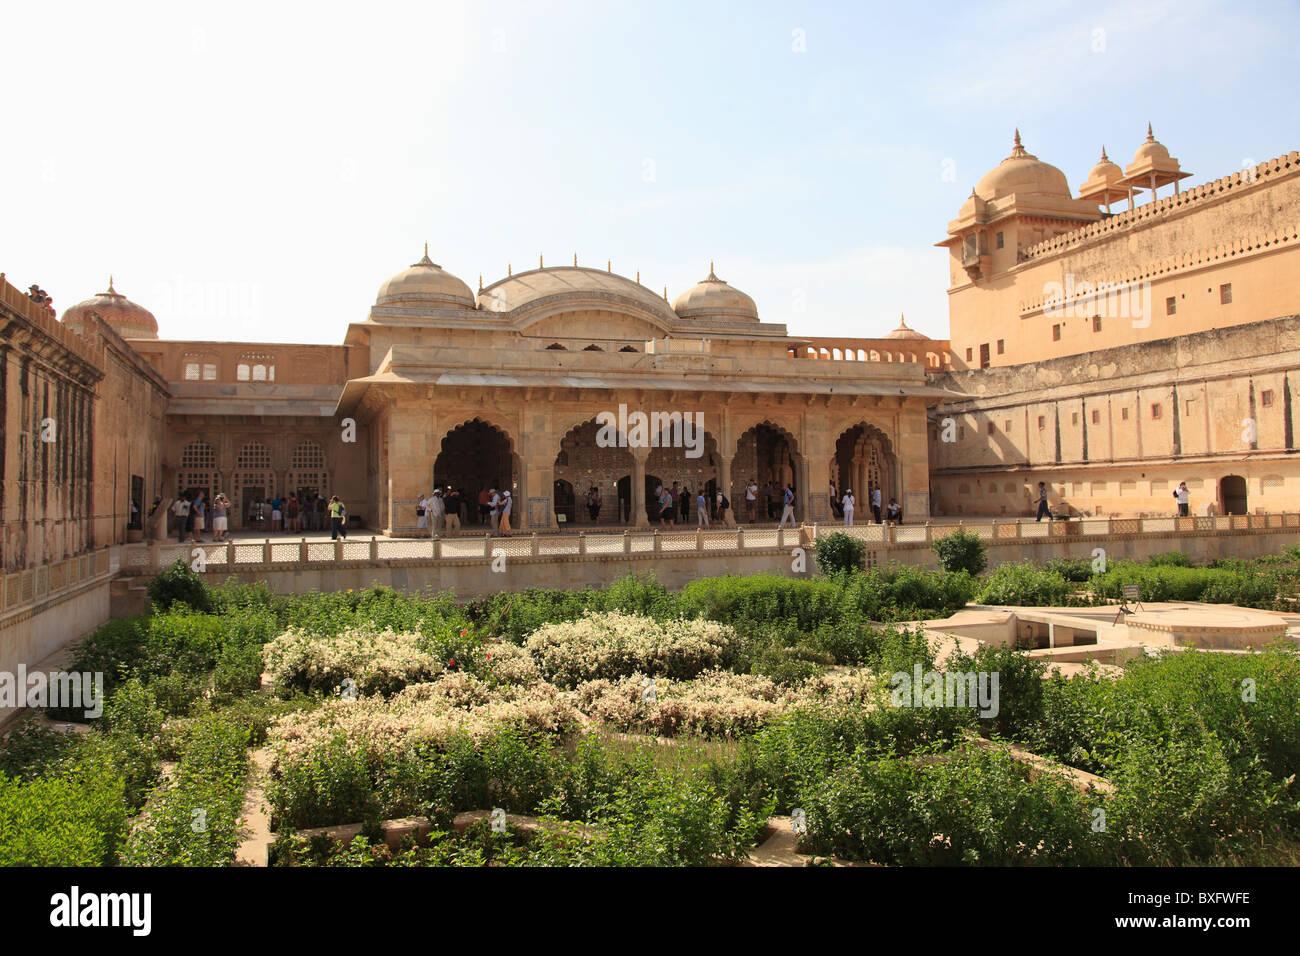 Royal Gardens, Amber Fort Palace, Jaipur, Rajasthan, India, Asia ...